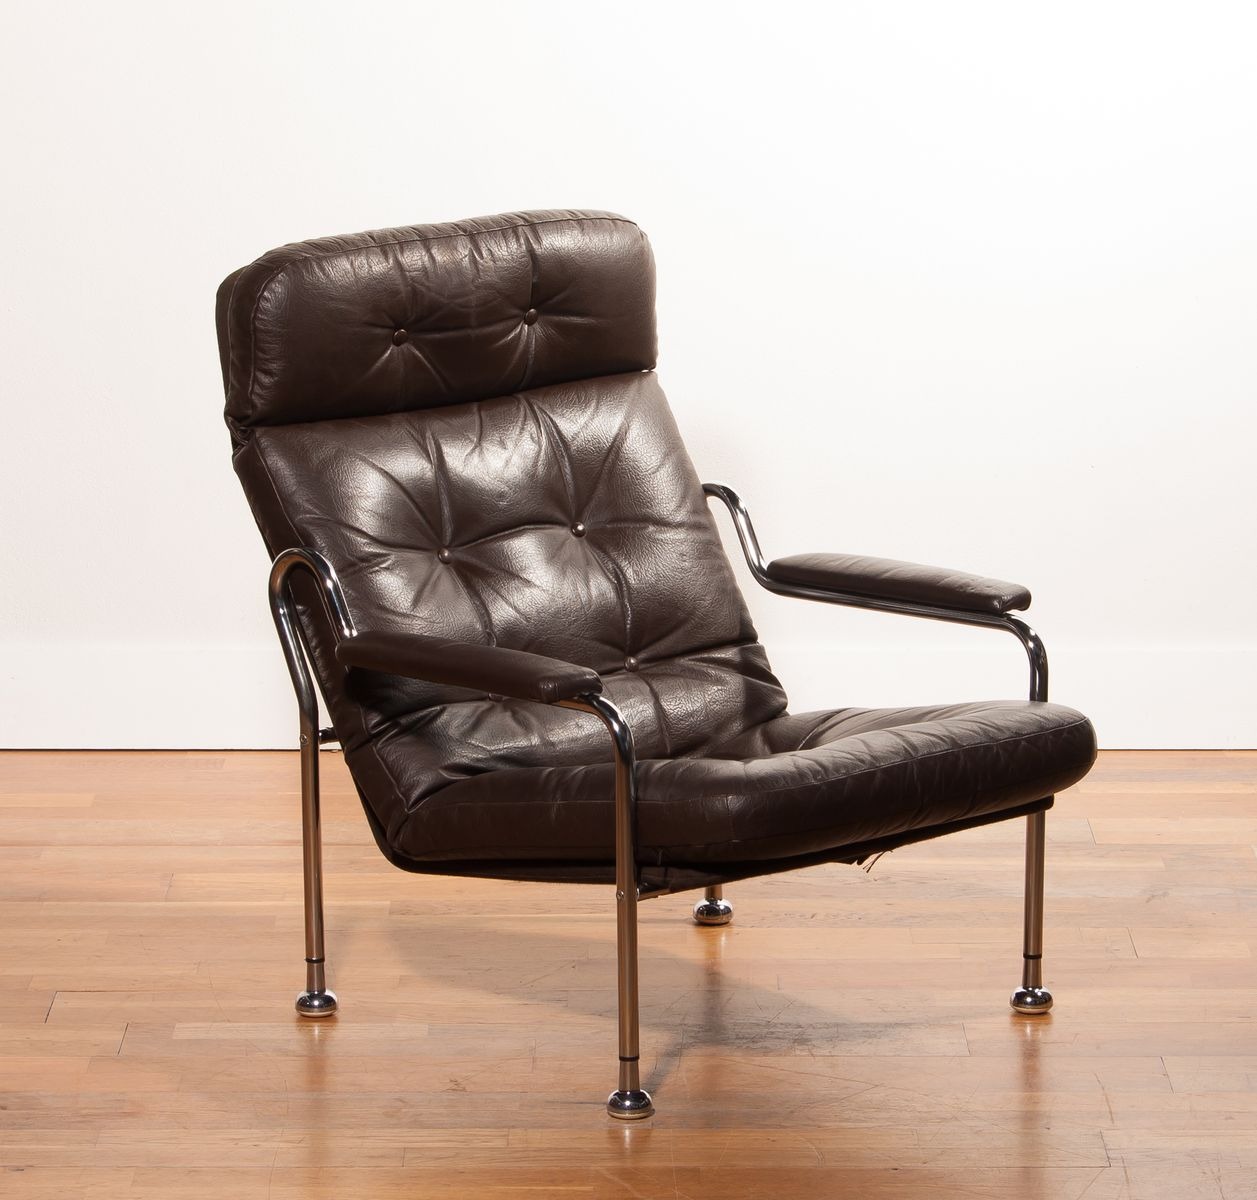 steel lounge chair desk amazon swedish brown leather and tubular 1970s